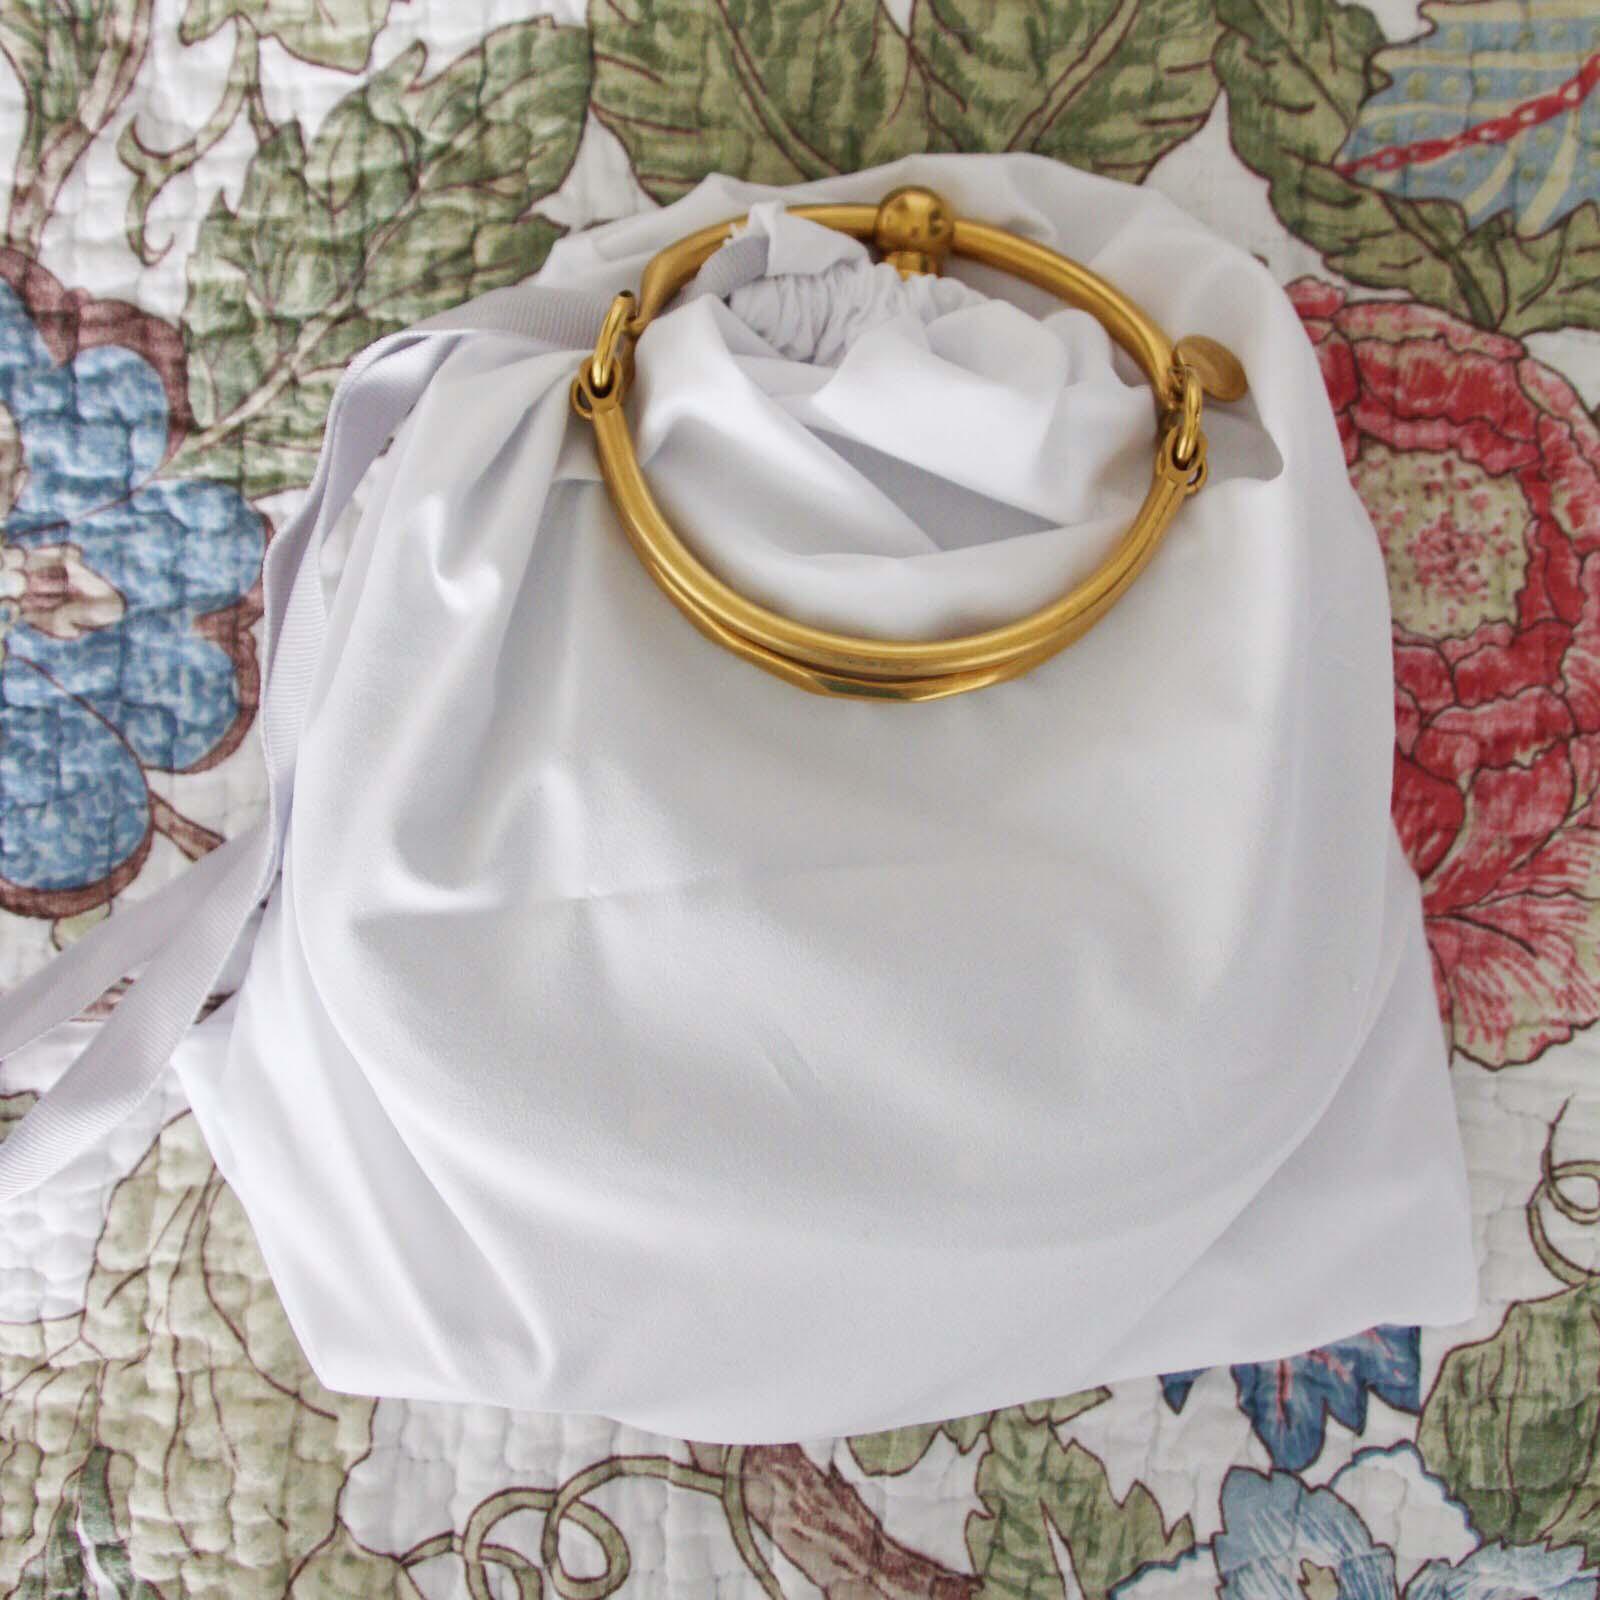 Care for Chloe Nile Bag